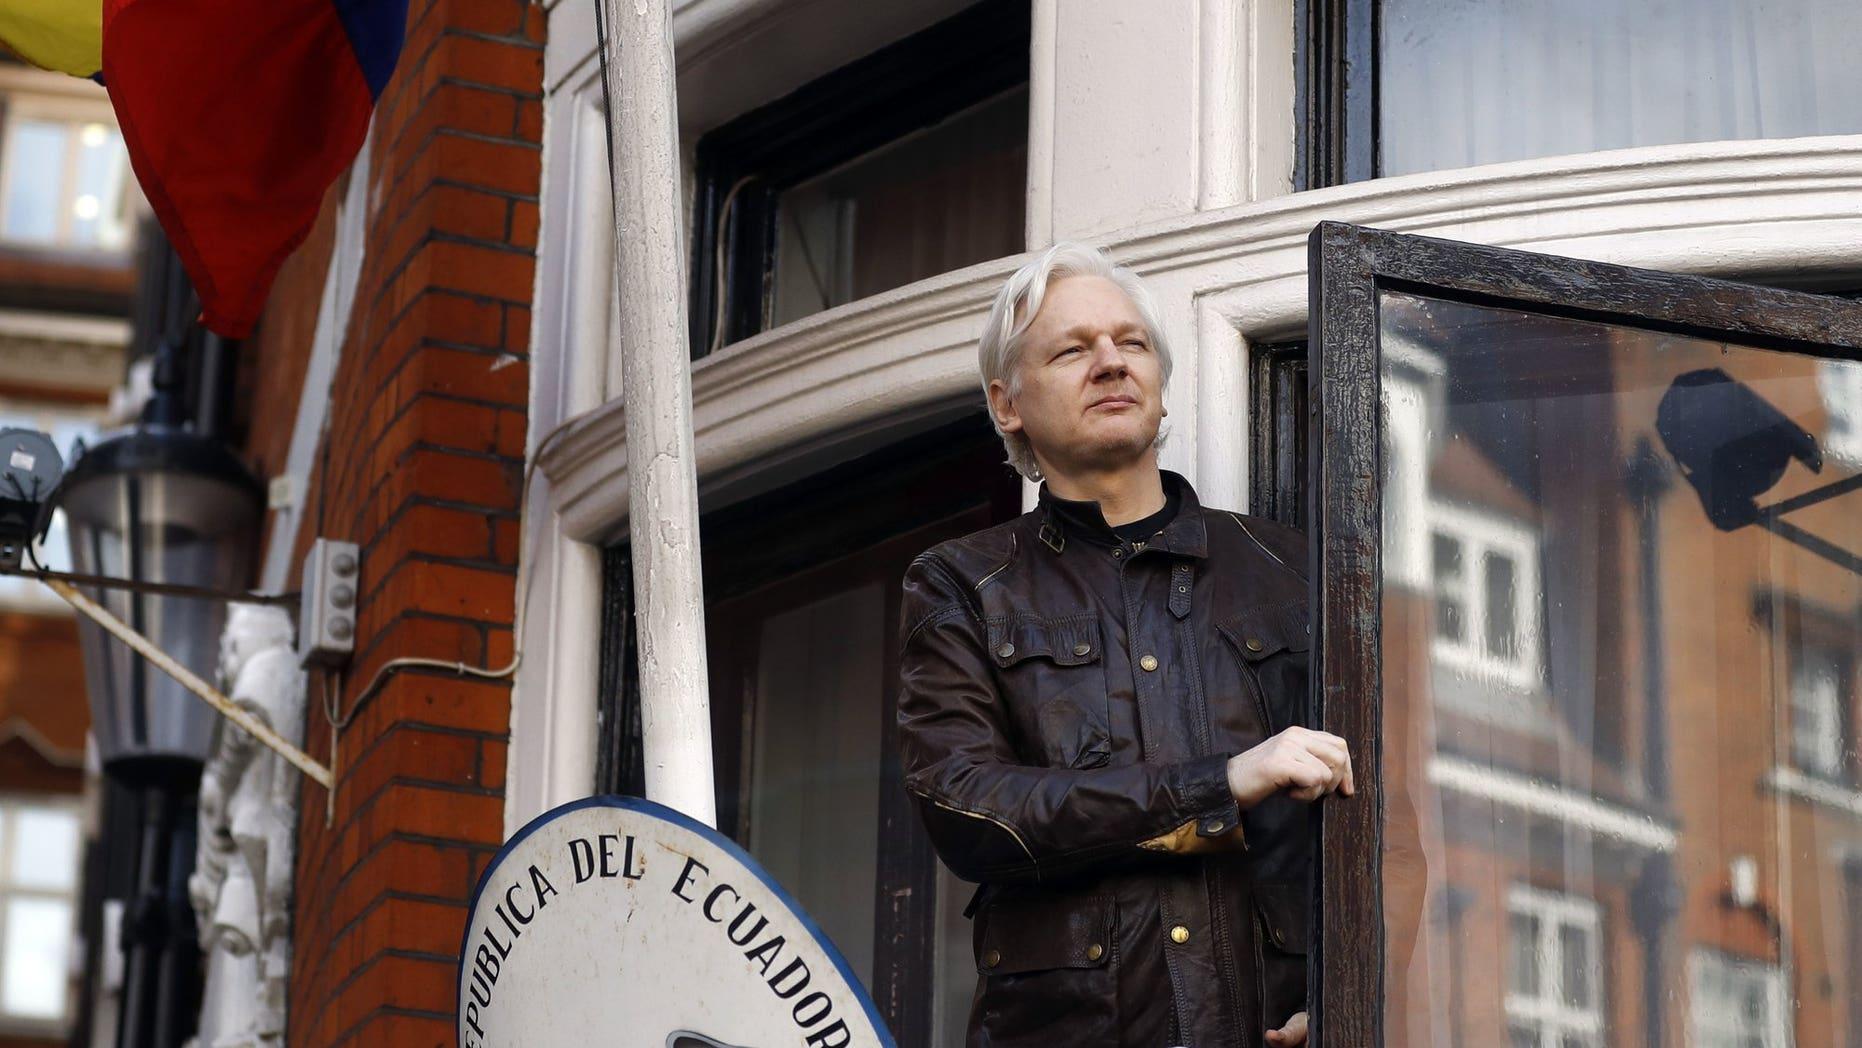 Ecuador Denies WikiLeaks Claim That It Plans To Expel Assange